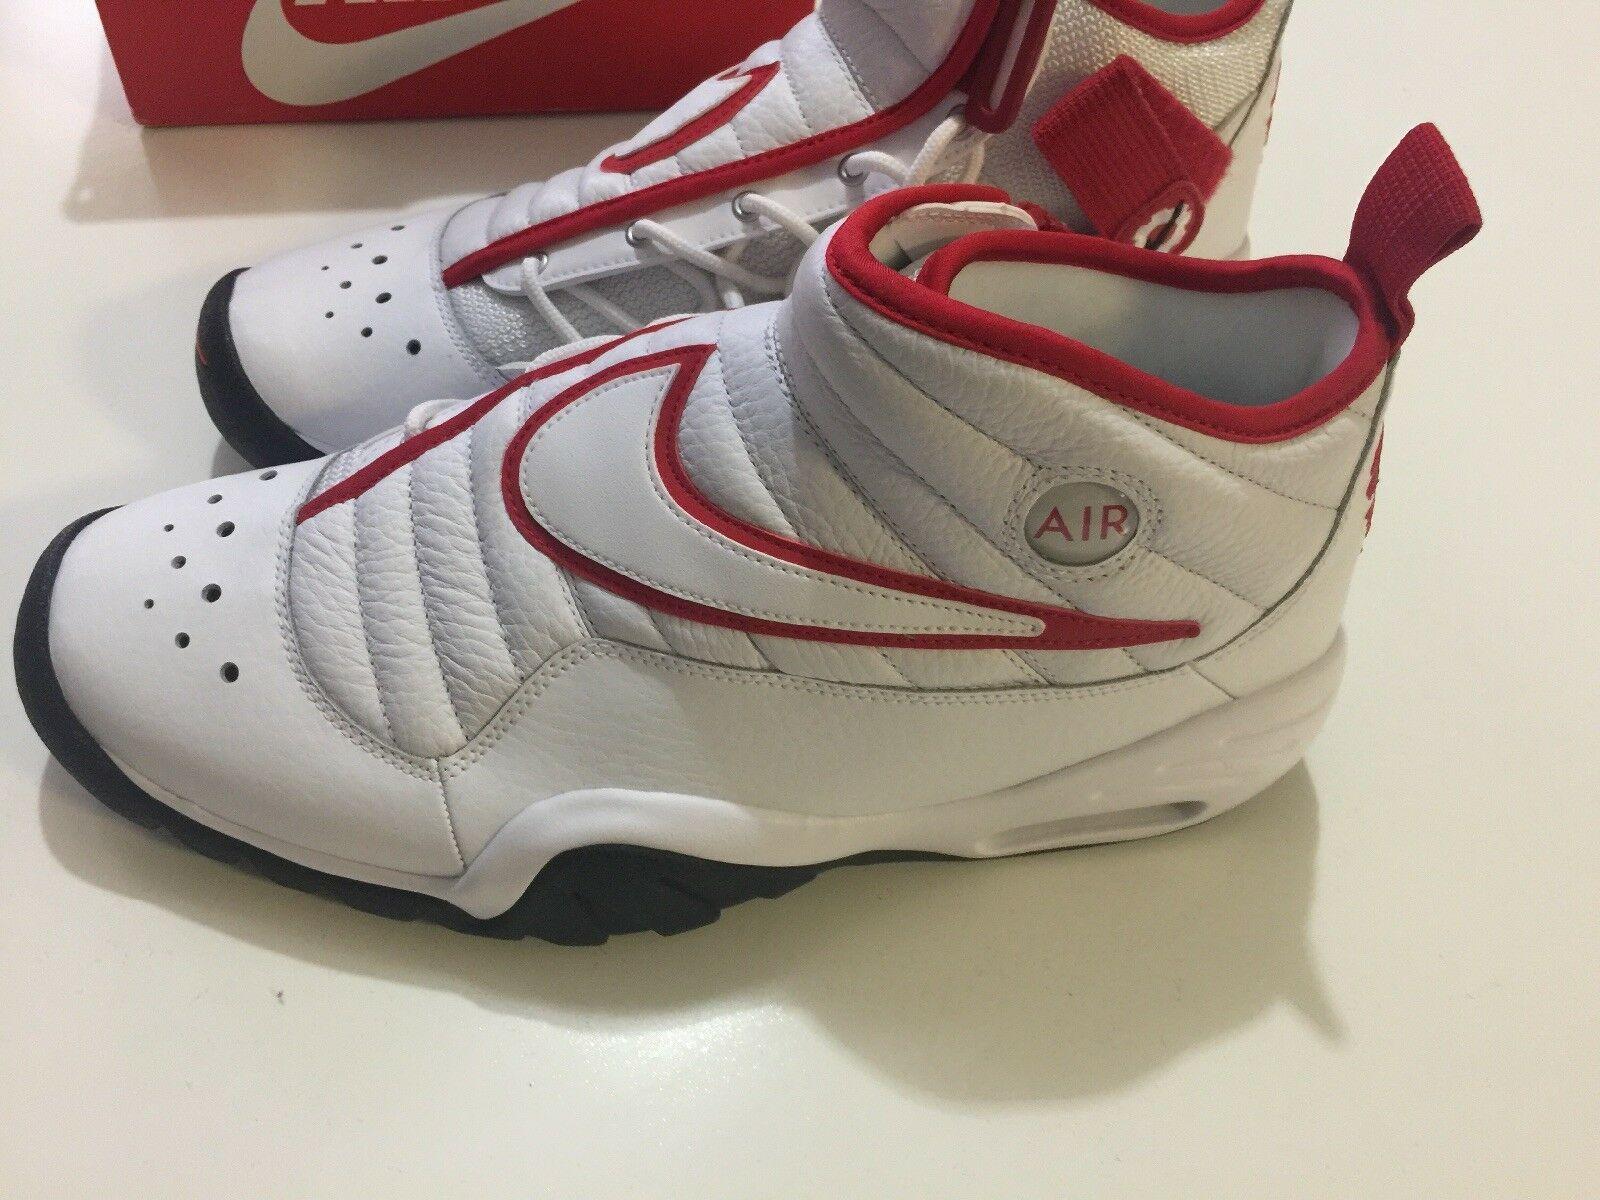 Nike Air Shake Ndestrukt Men's Basketball Shoes White/Red 880869 100 Size 11 image 6